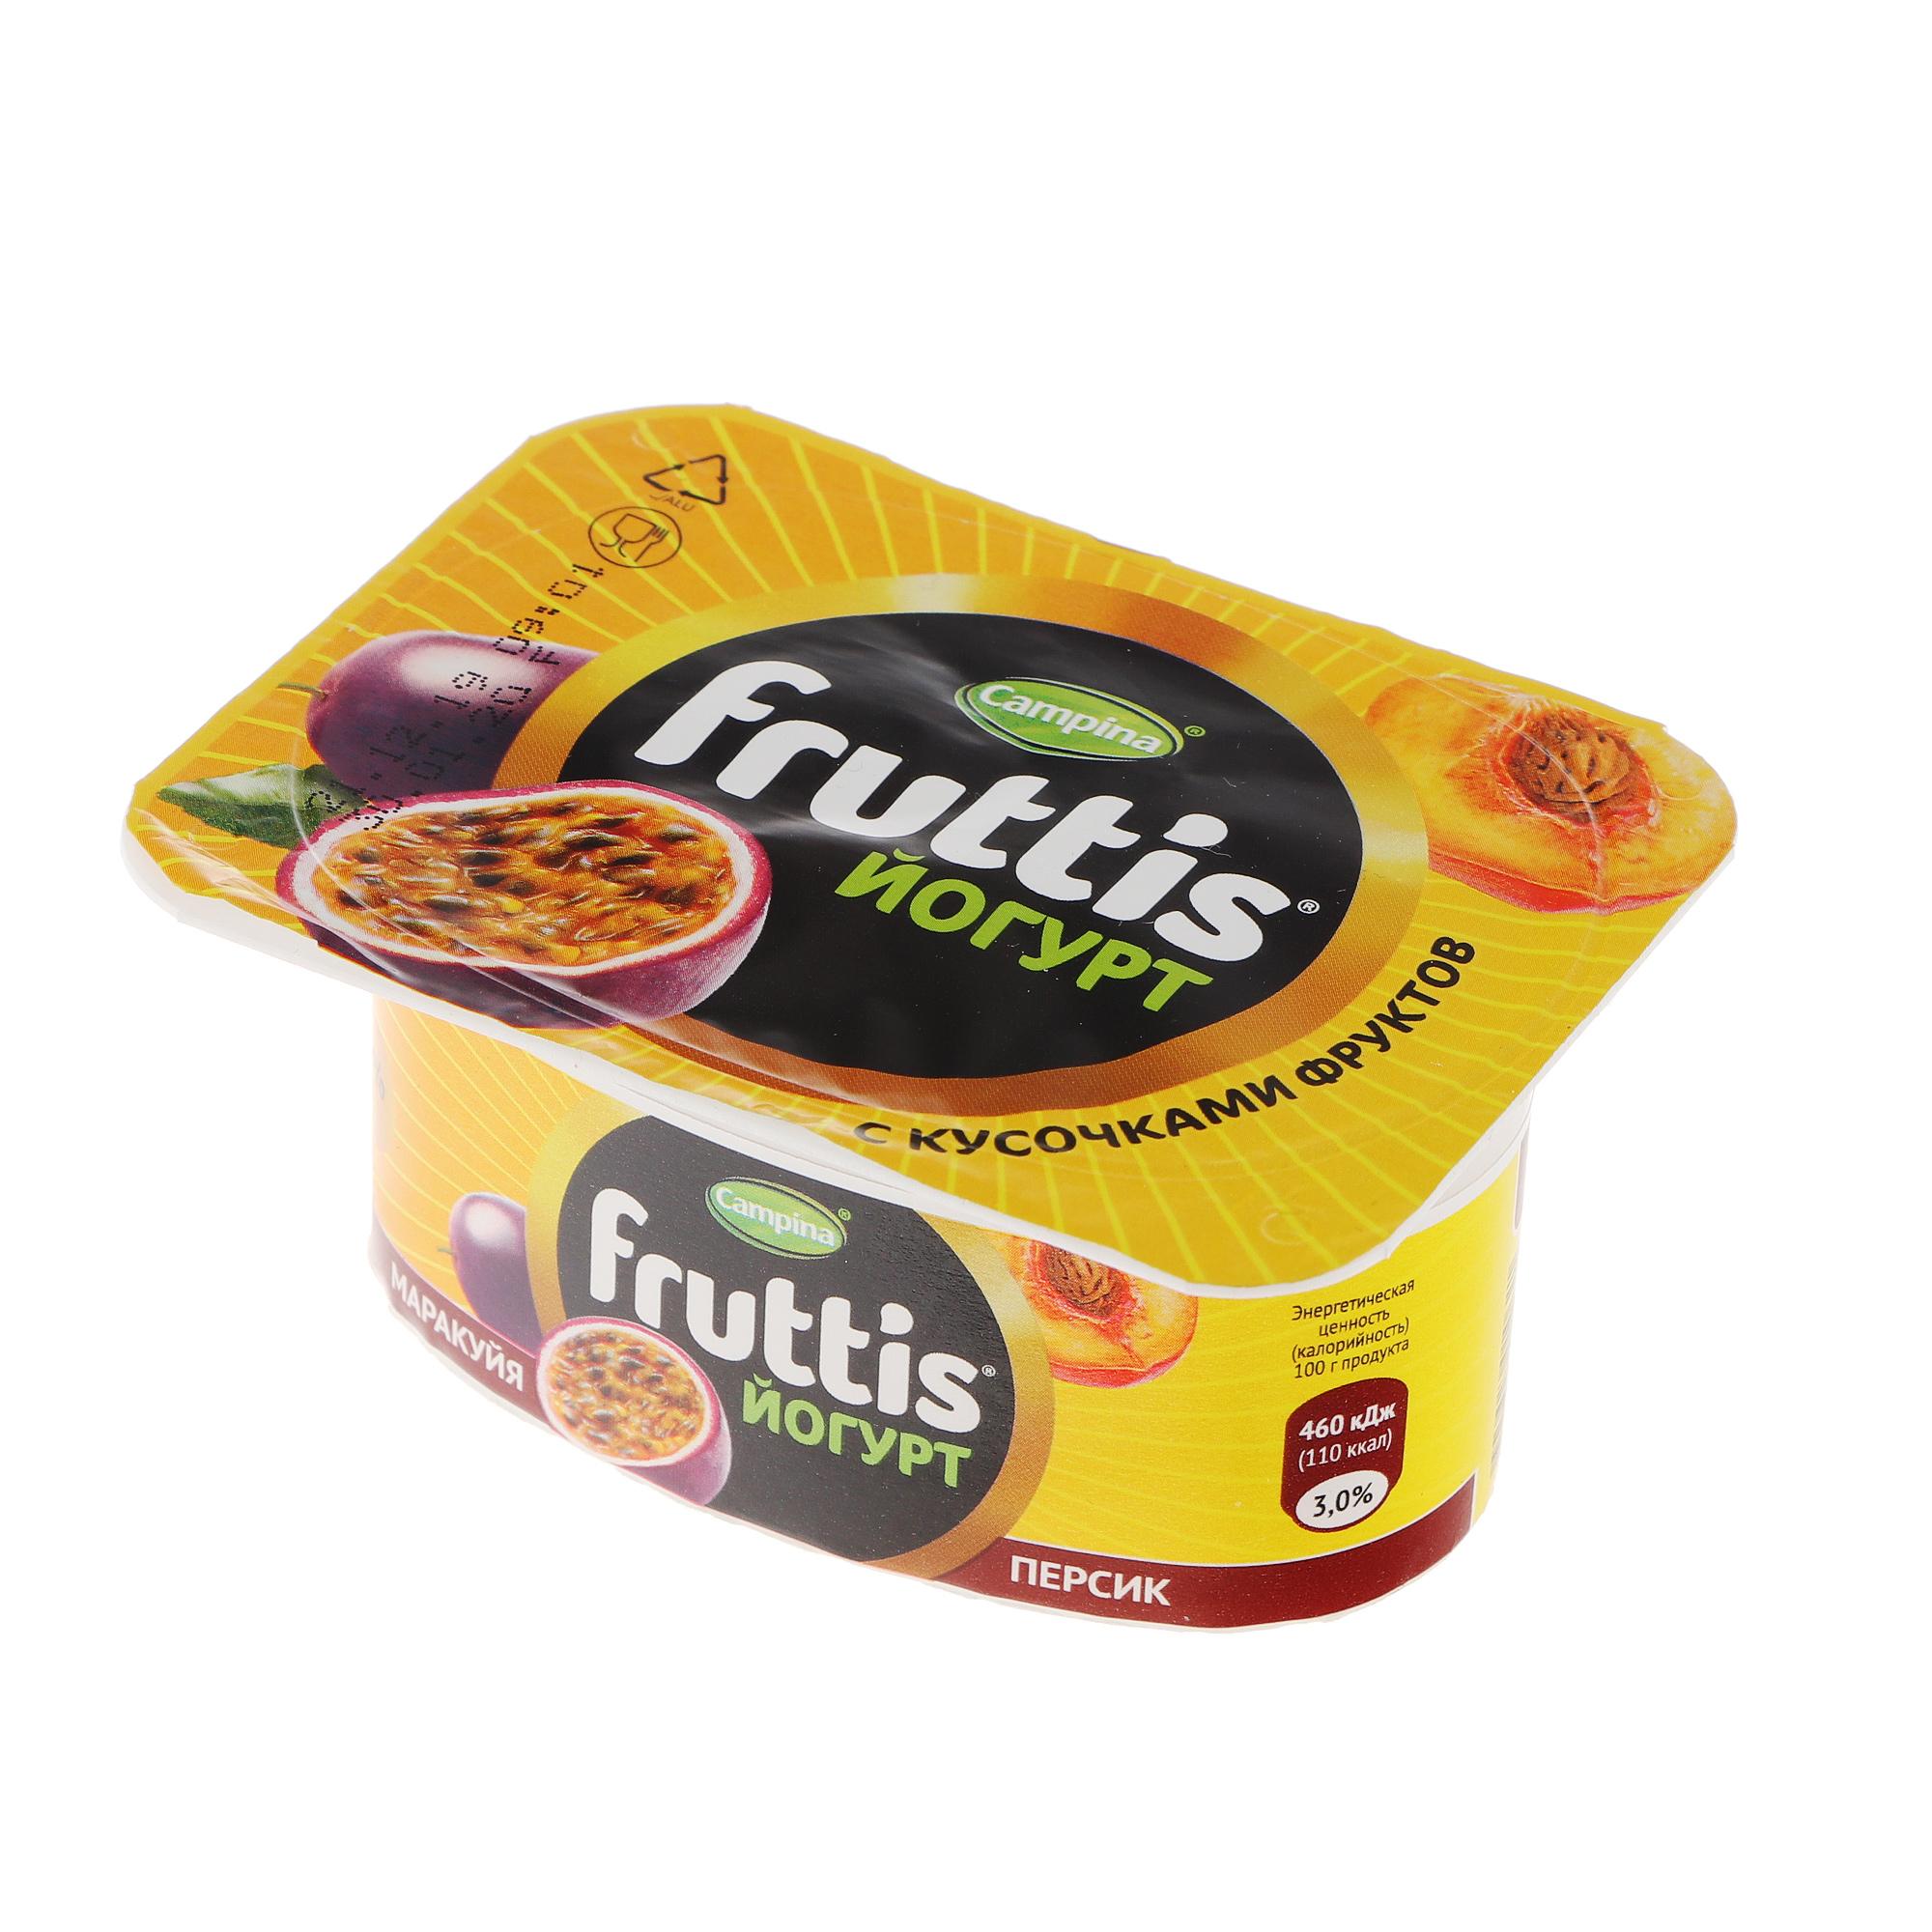 Фото - Йогурт Campina Fruttis Абрикос, манго, персик, маракуйя 3% 110 г йогурт campina fruttis легкий клубника 0 1% 110 г